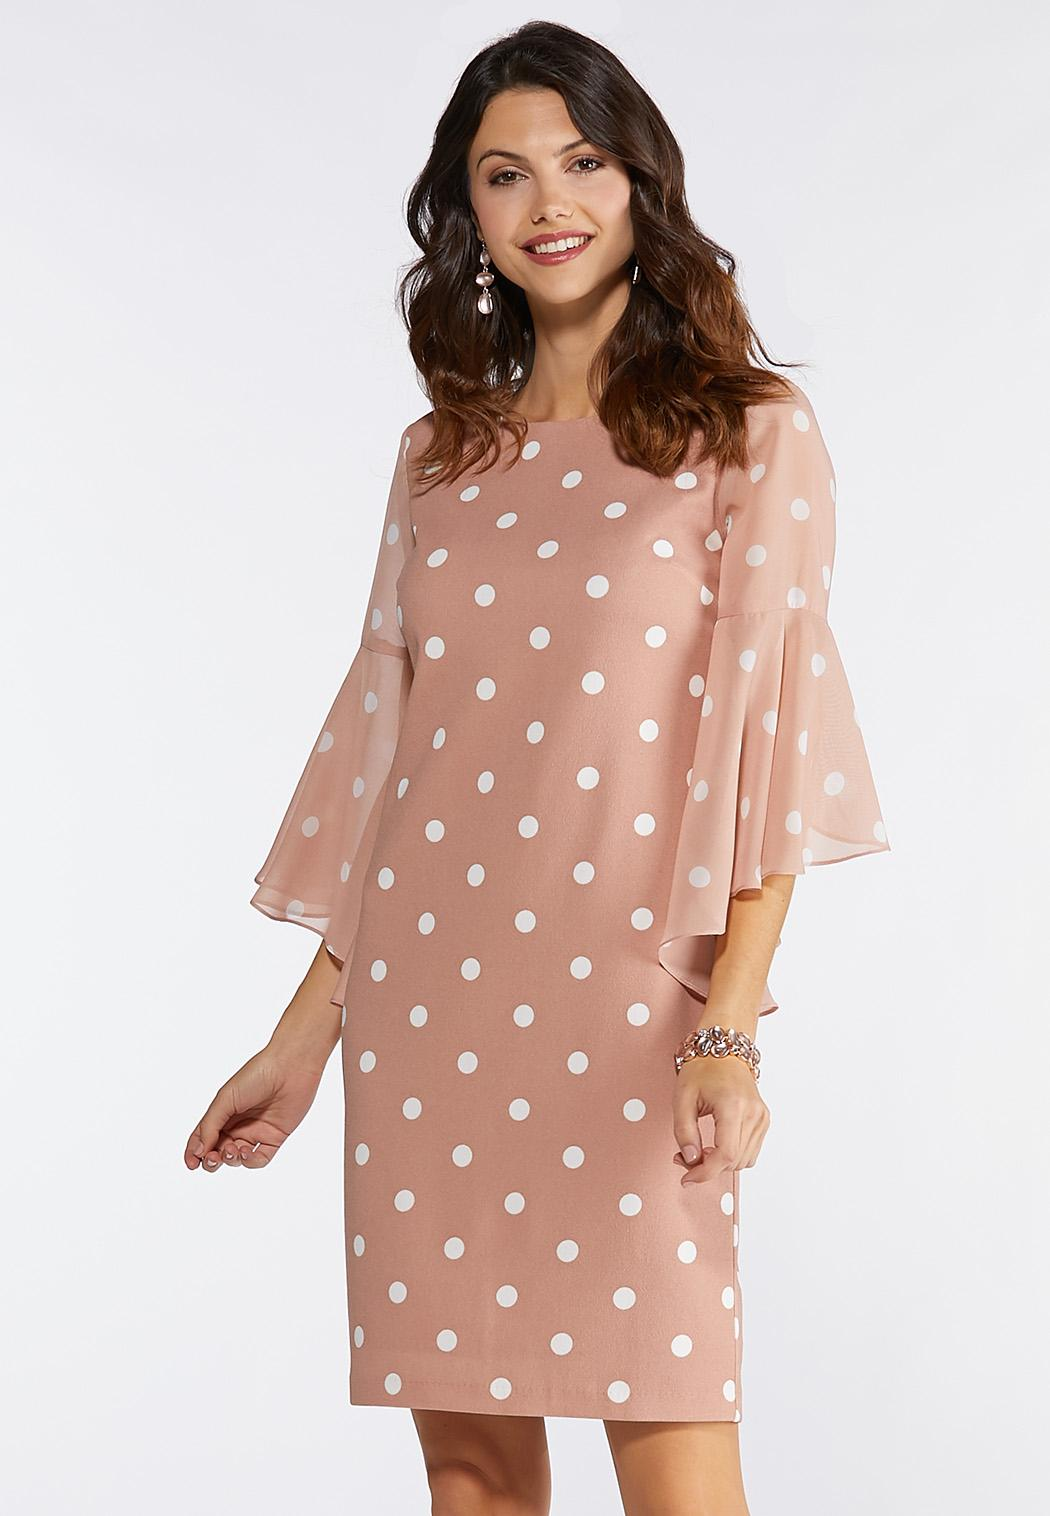 080bc63dc96 Women s Dresses sizes 2-28 - Spring Dresses